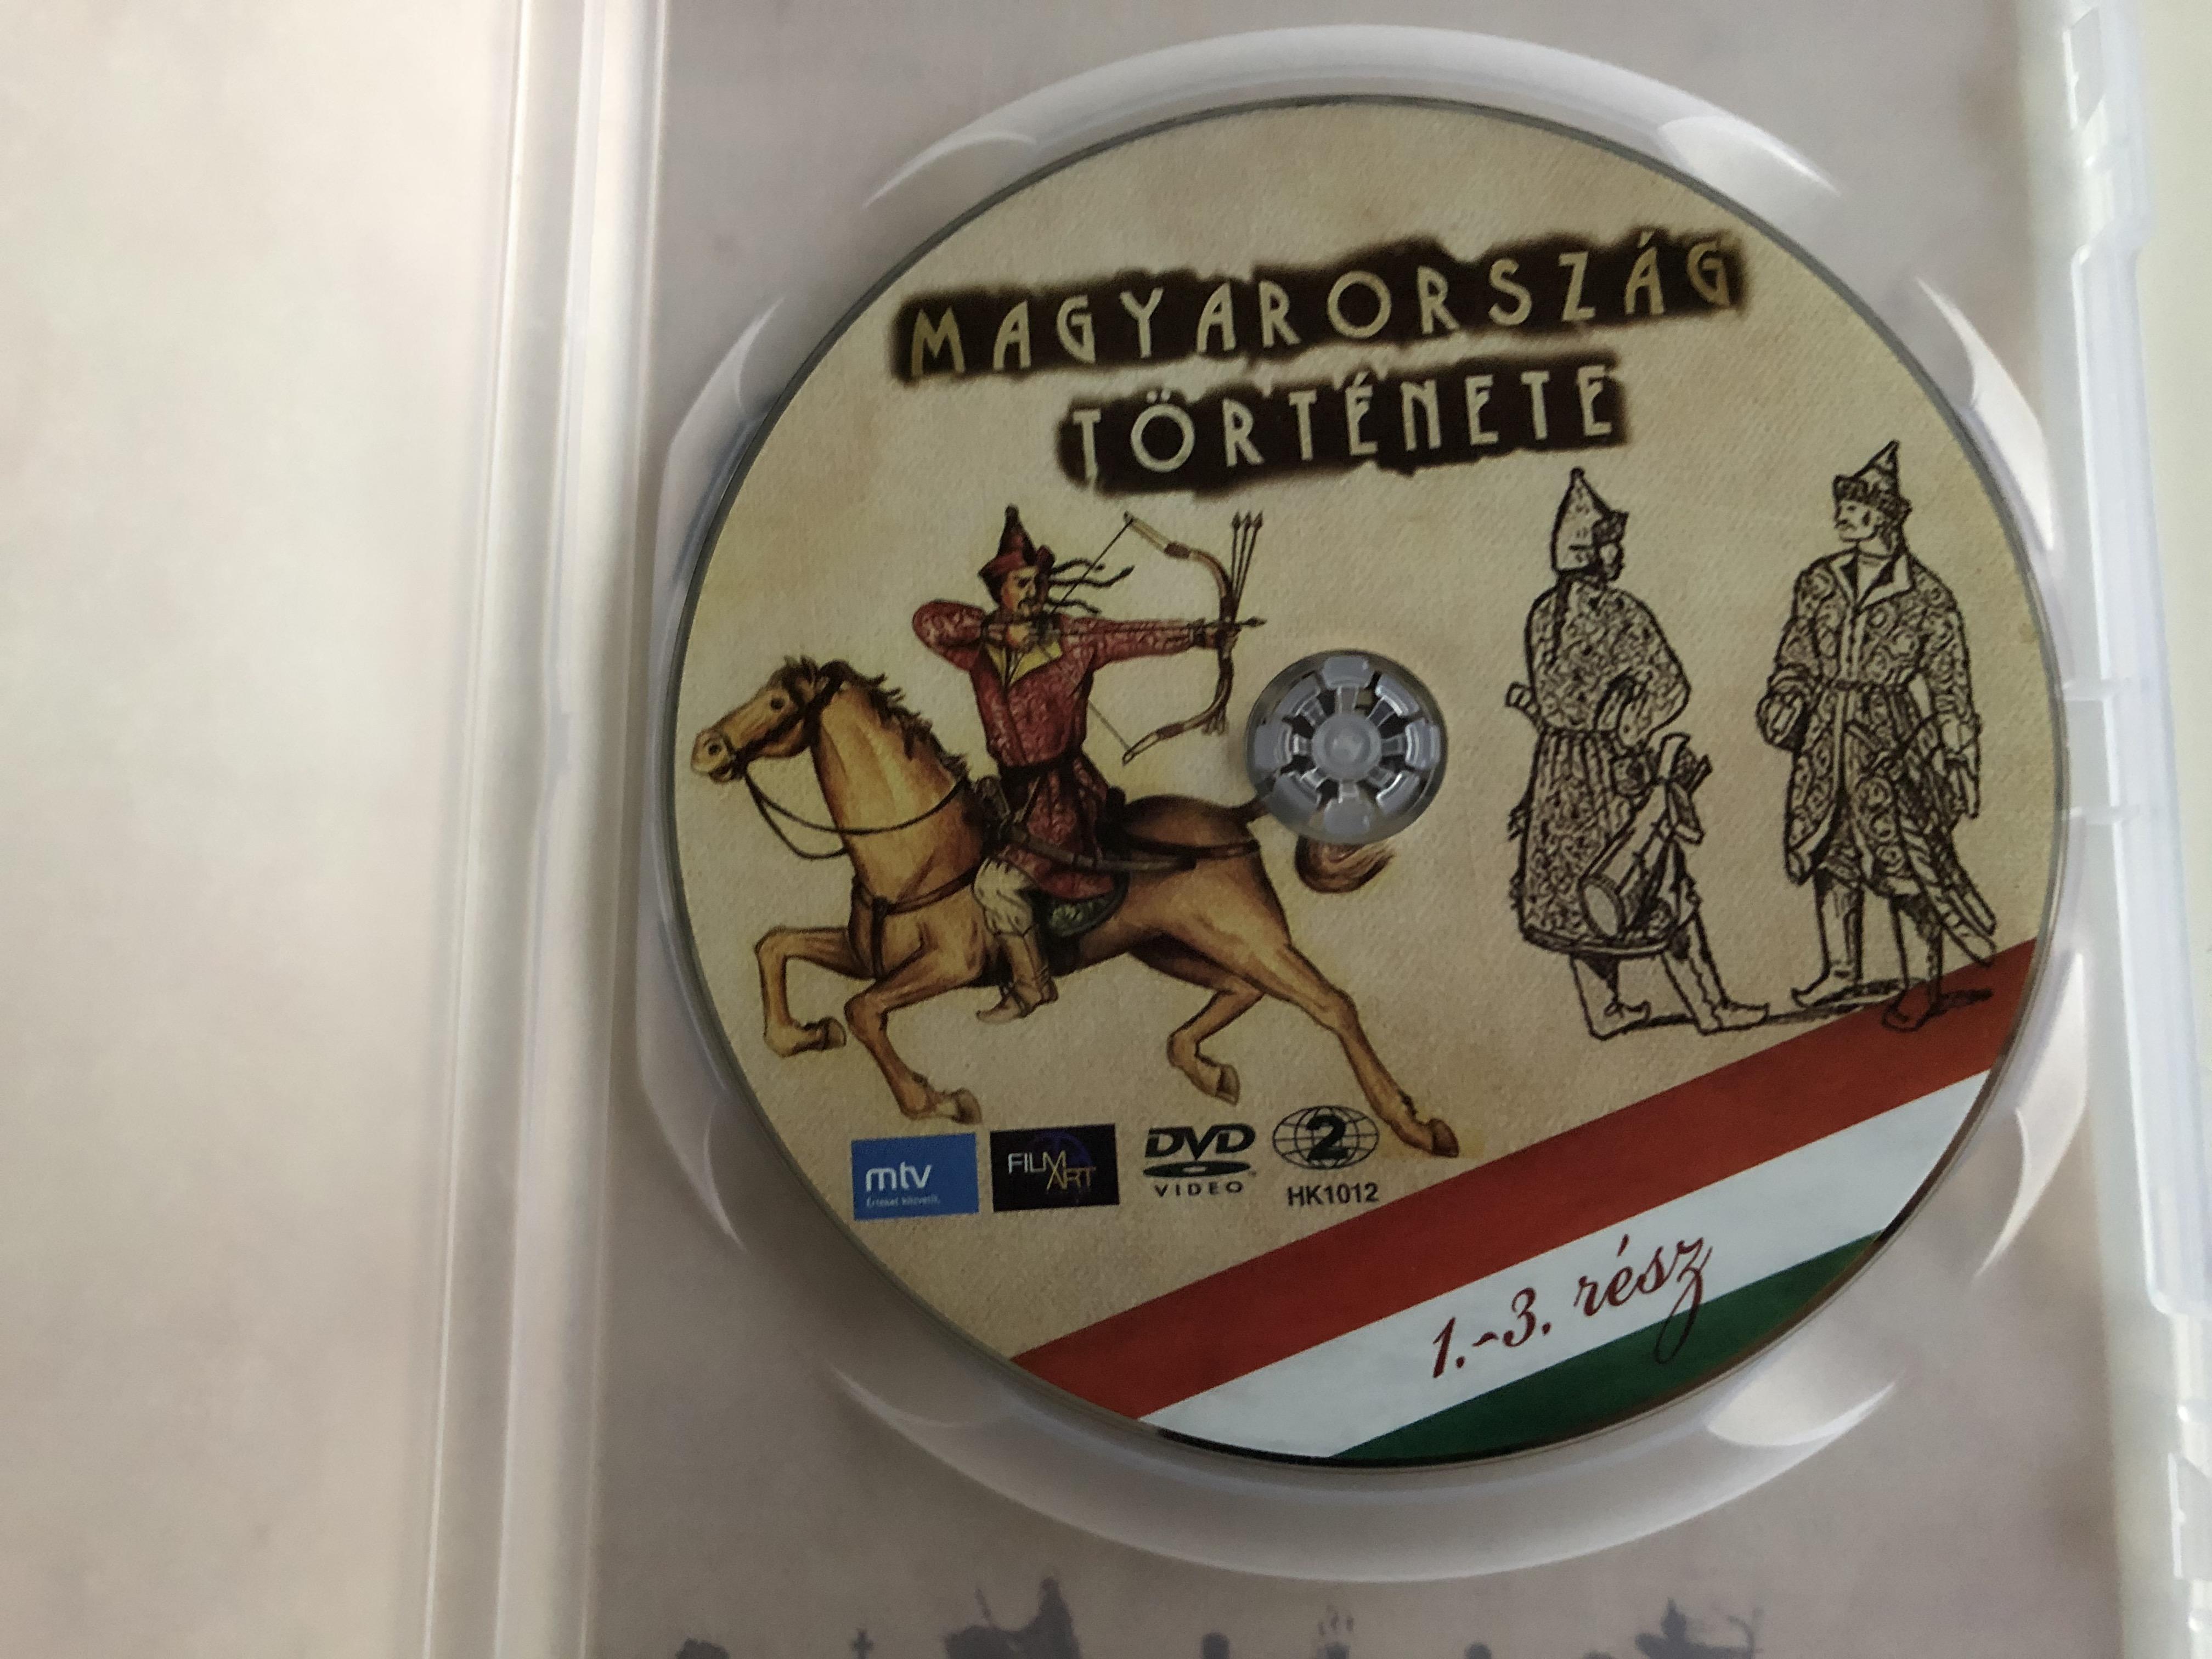 magyarorsz-g-t-rt-nete-1.-dvd-history-of-hungary-1.-episodes-1-3.-2.jpg